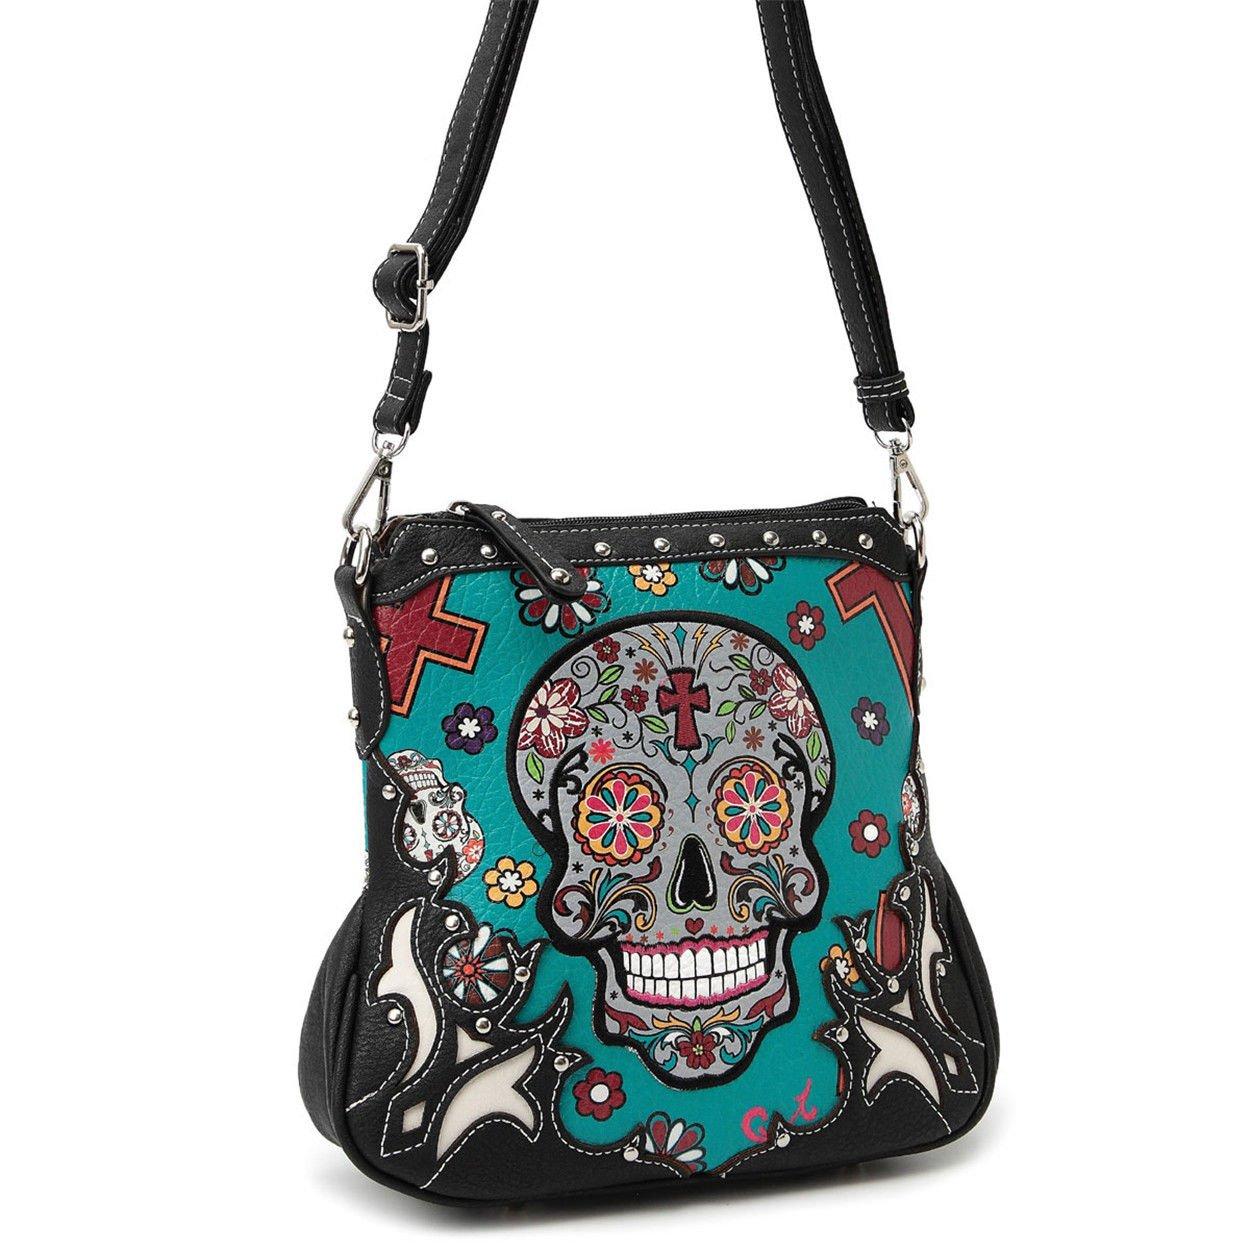 Western Sugar Skull Mini Handbag Girl Crossbody Purse Fashion Single Shoulder Bag Phone Purses (Turquoise) by WESTERN ORIGIN (Image #2)